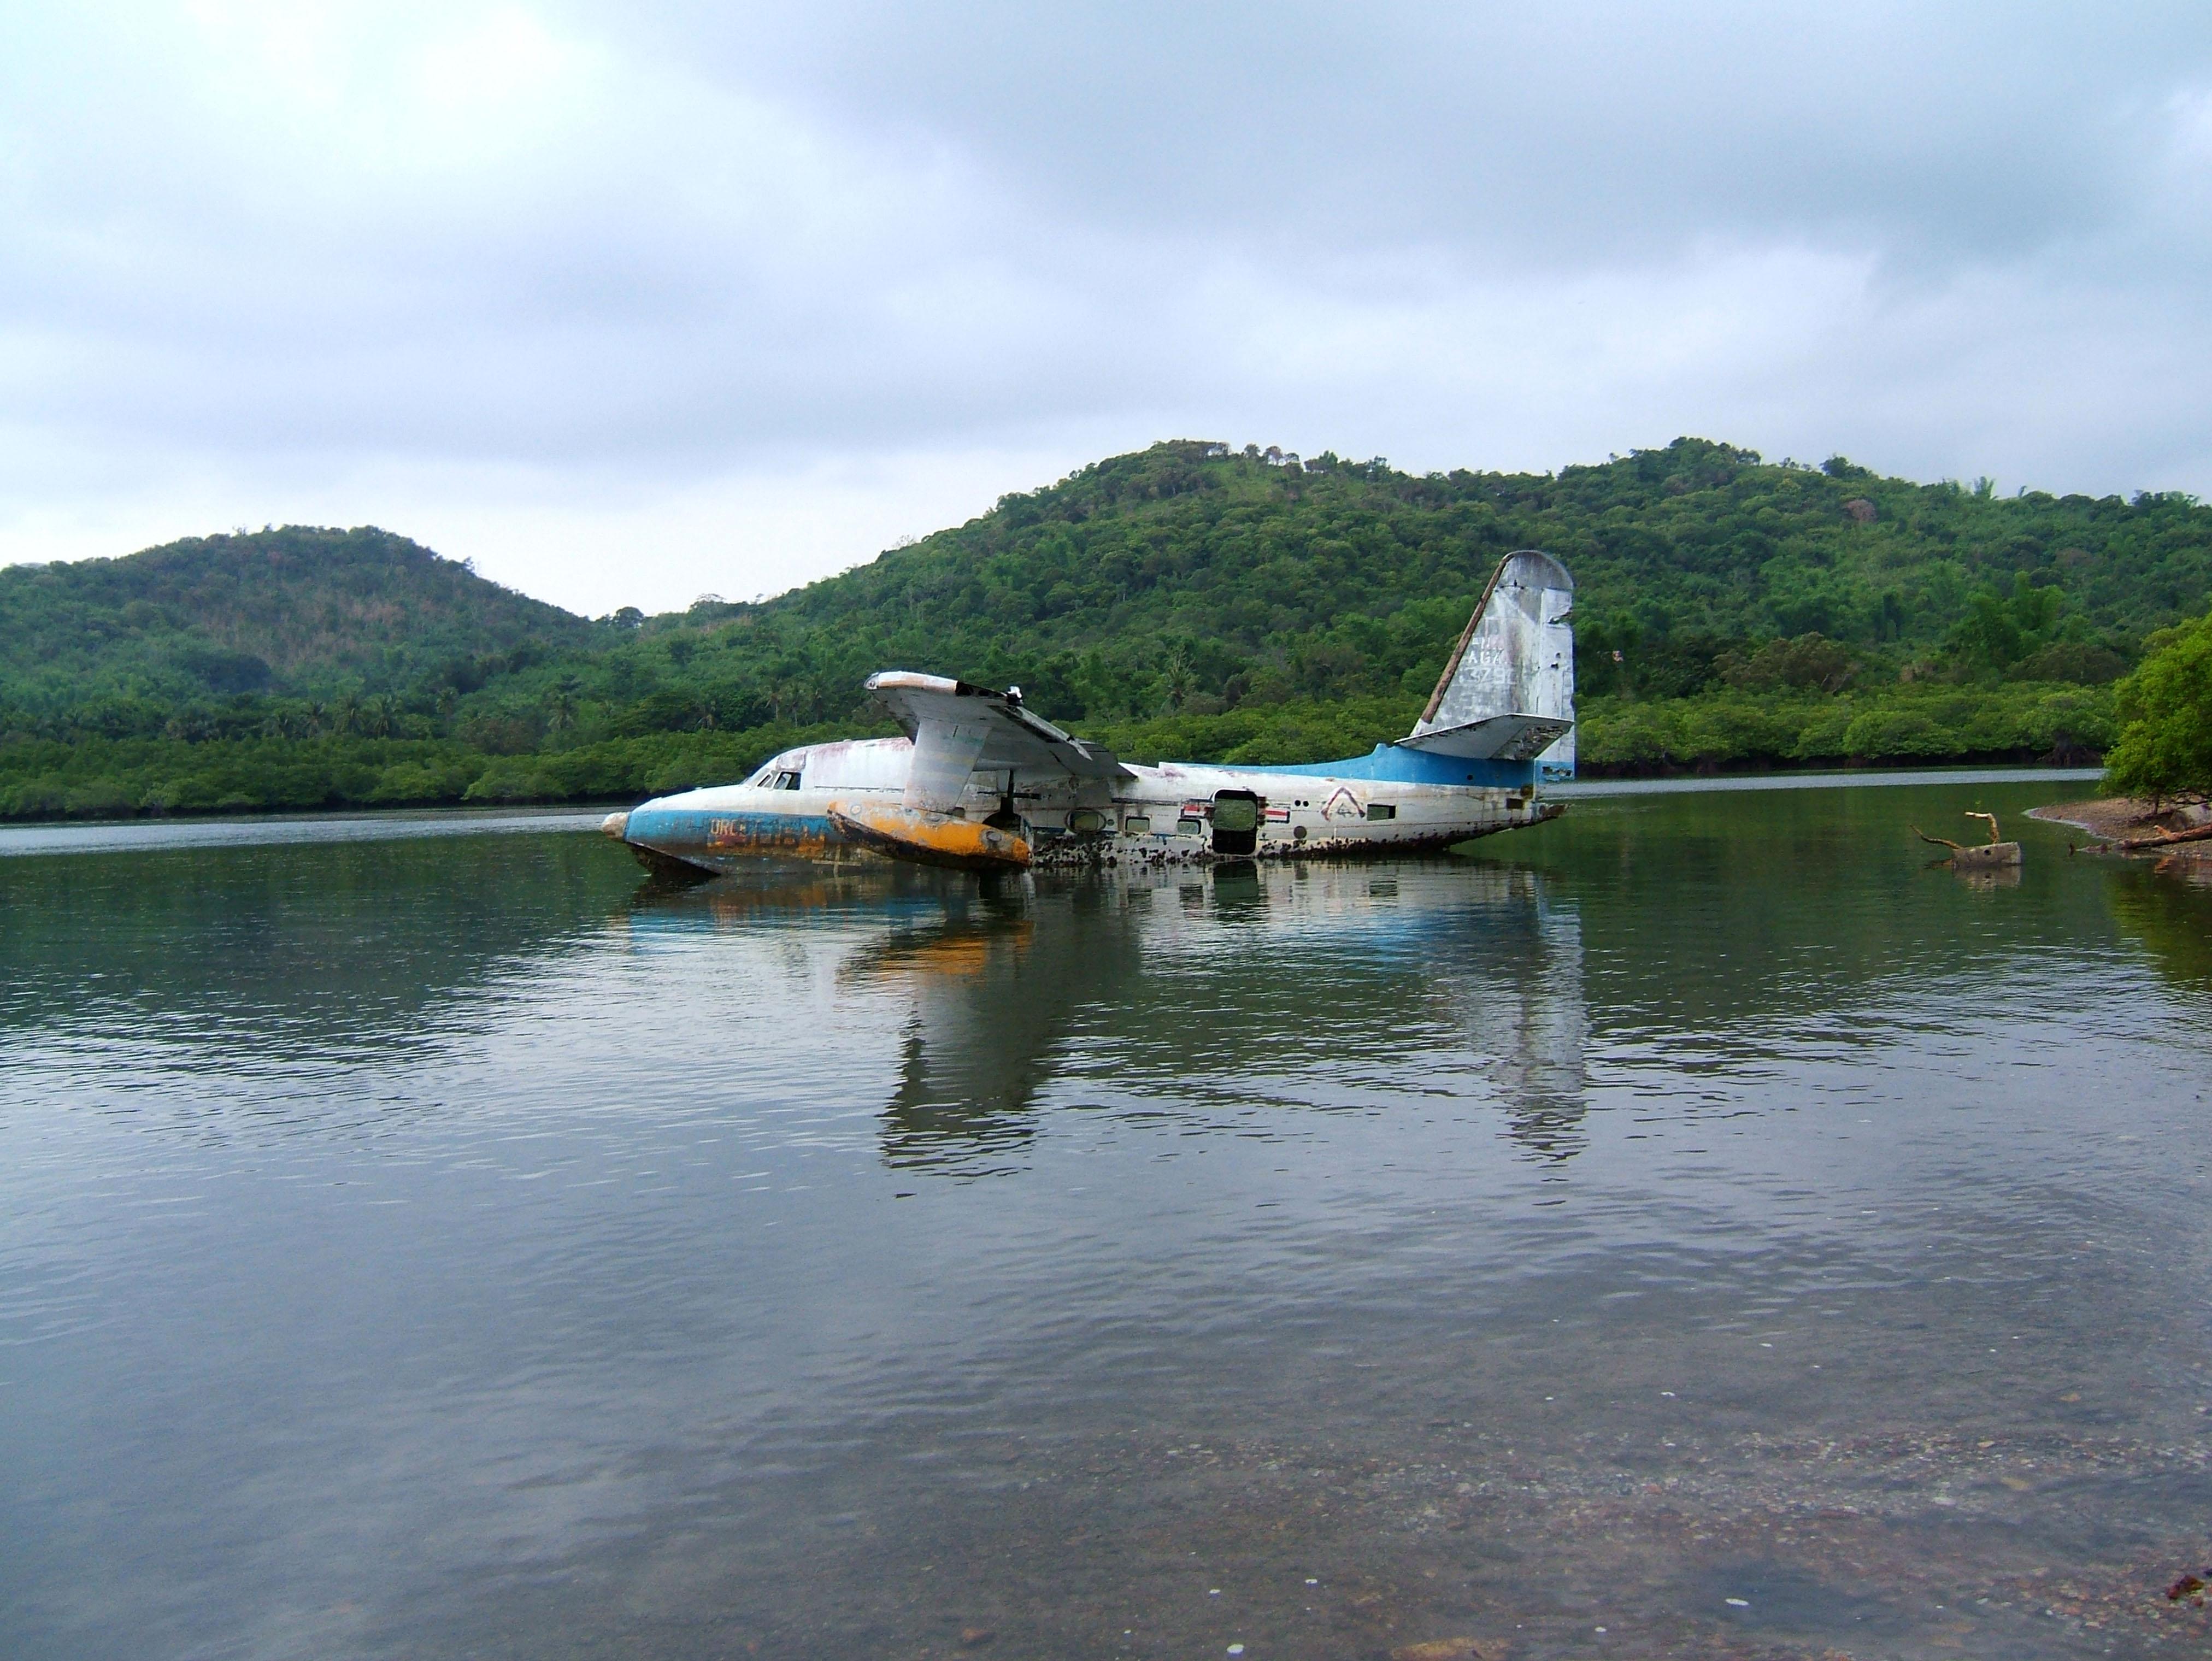 USN Bul No 137906 UF 1 Albatross Philippine AF Coron Bay July 2005 11